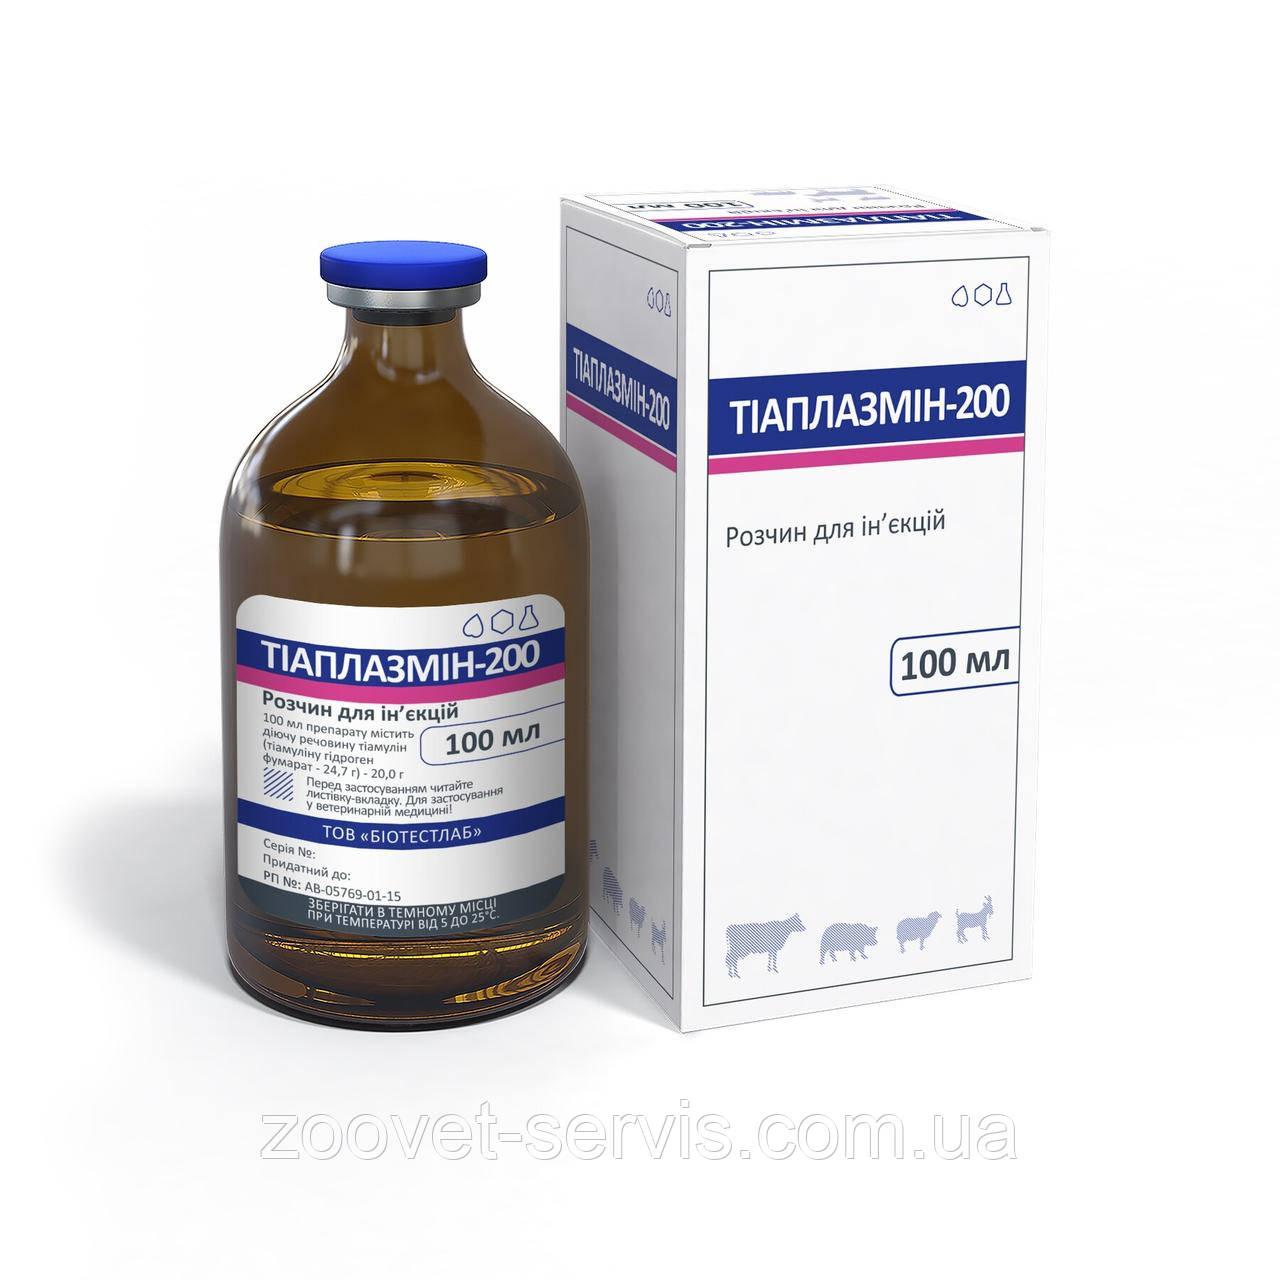 Раствор инъекционный для свиней тиамулин 20% Тиаплазмин-200 БиоТестЛаб флакон - 100 мл